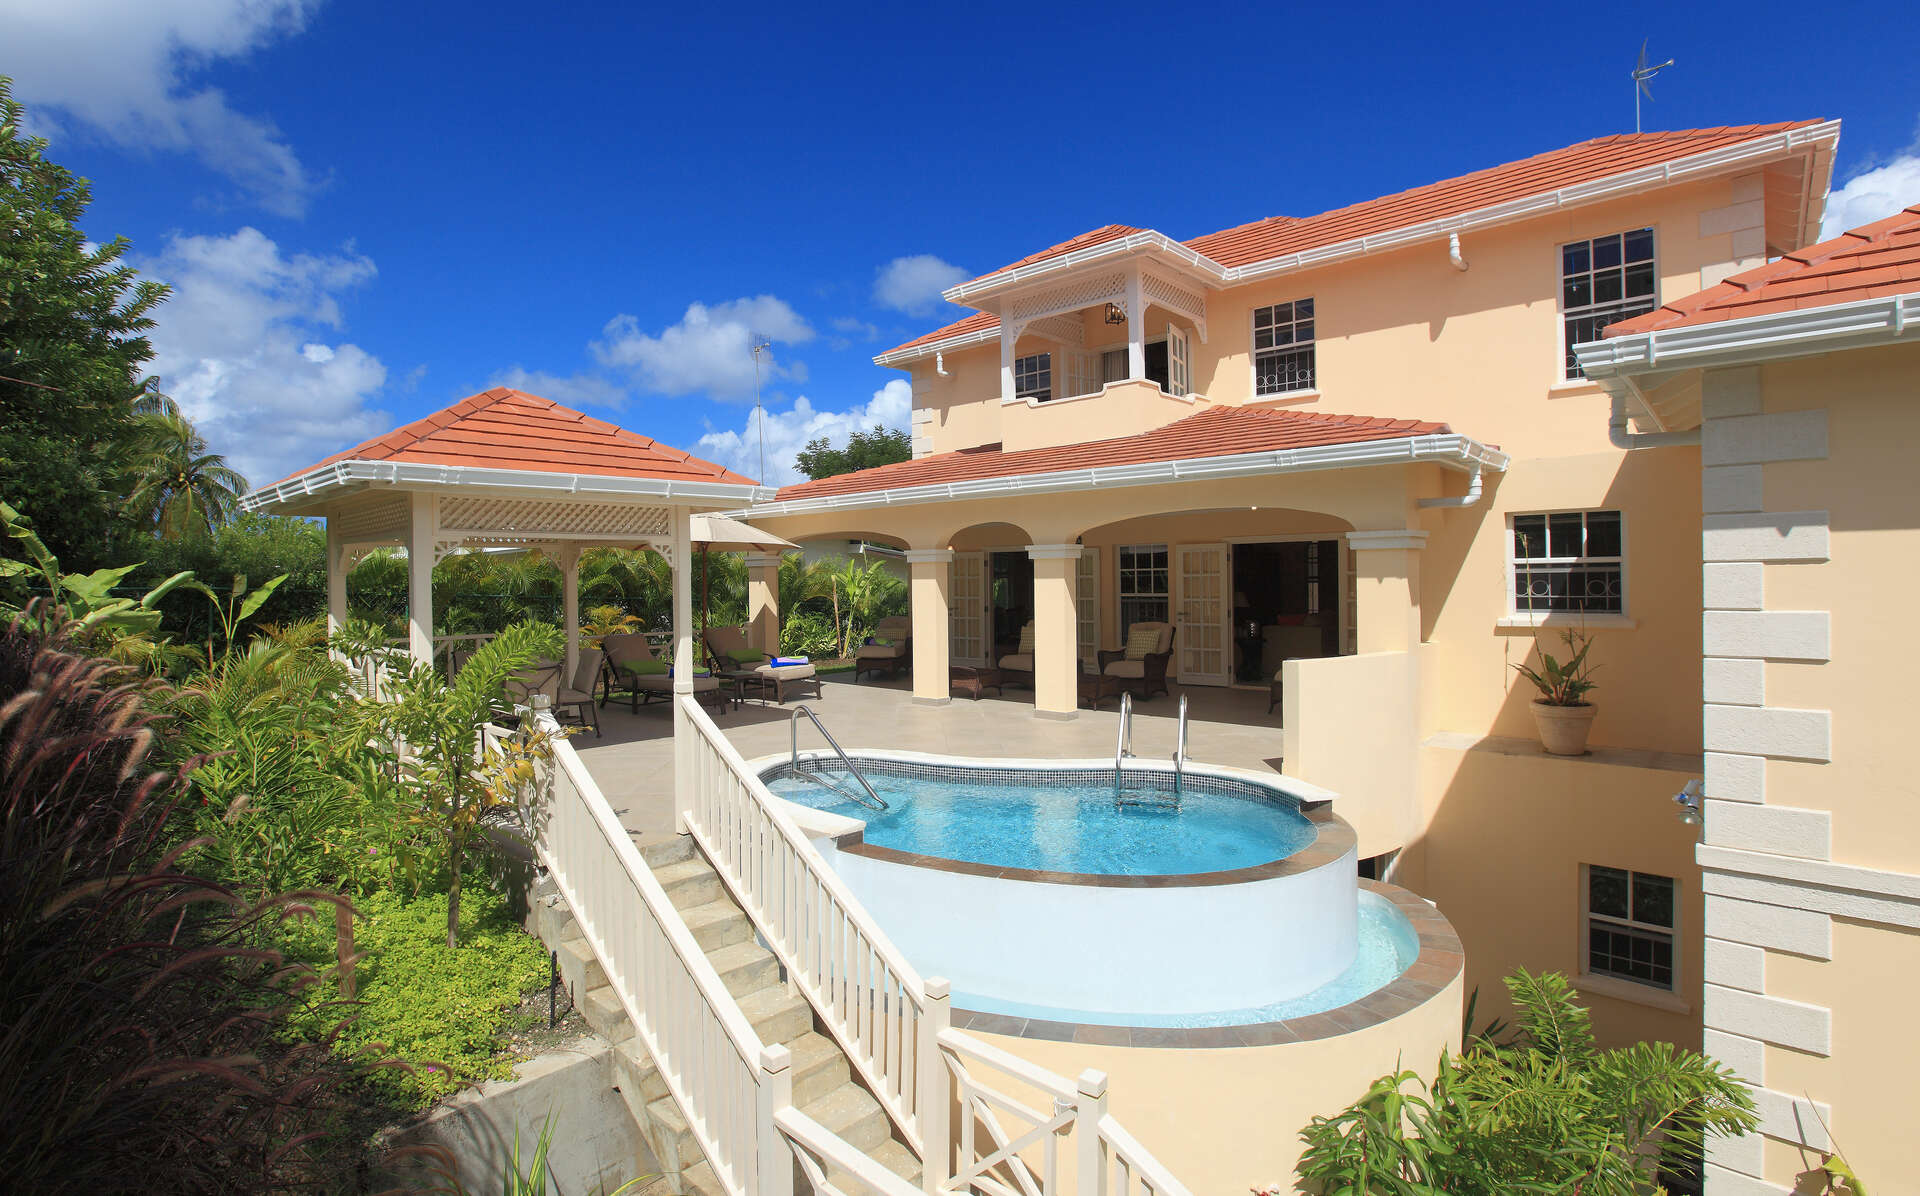 Luxury villa rentals caribbean - Barbados - St james - Sunset crest - Tara - Image 1/12